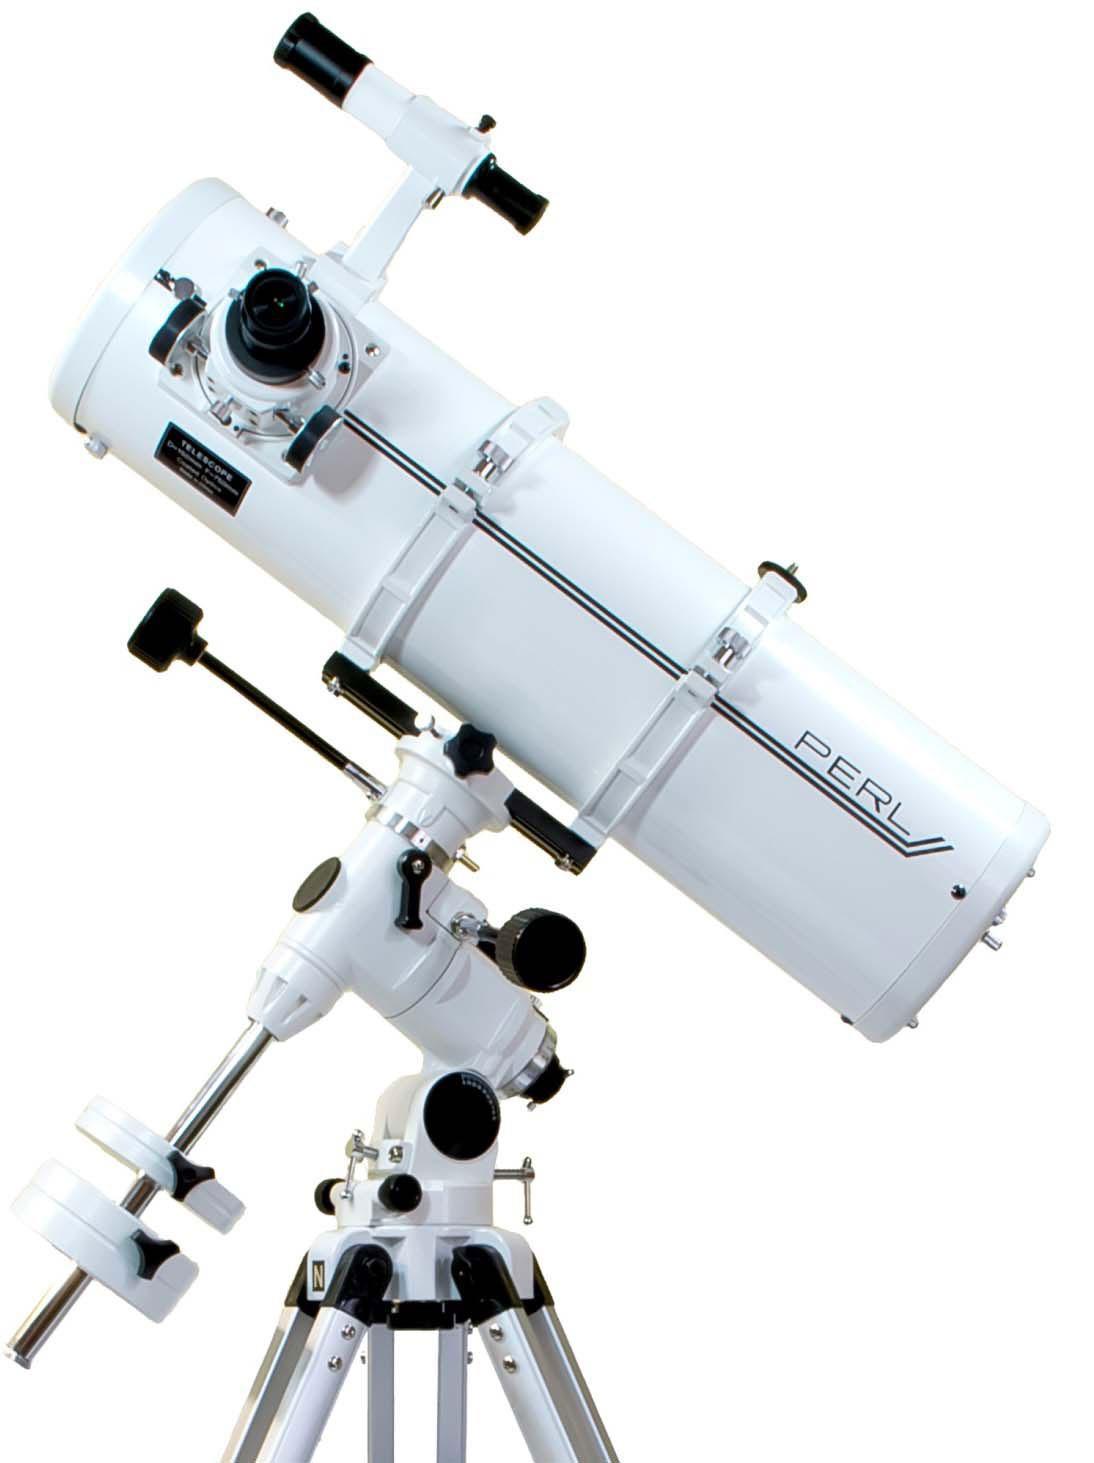 Télescope Perl Bellatrix TP 29 150/750 EQ3-2 - Motorisation double axe